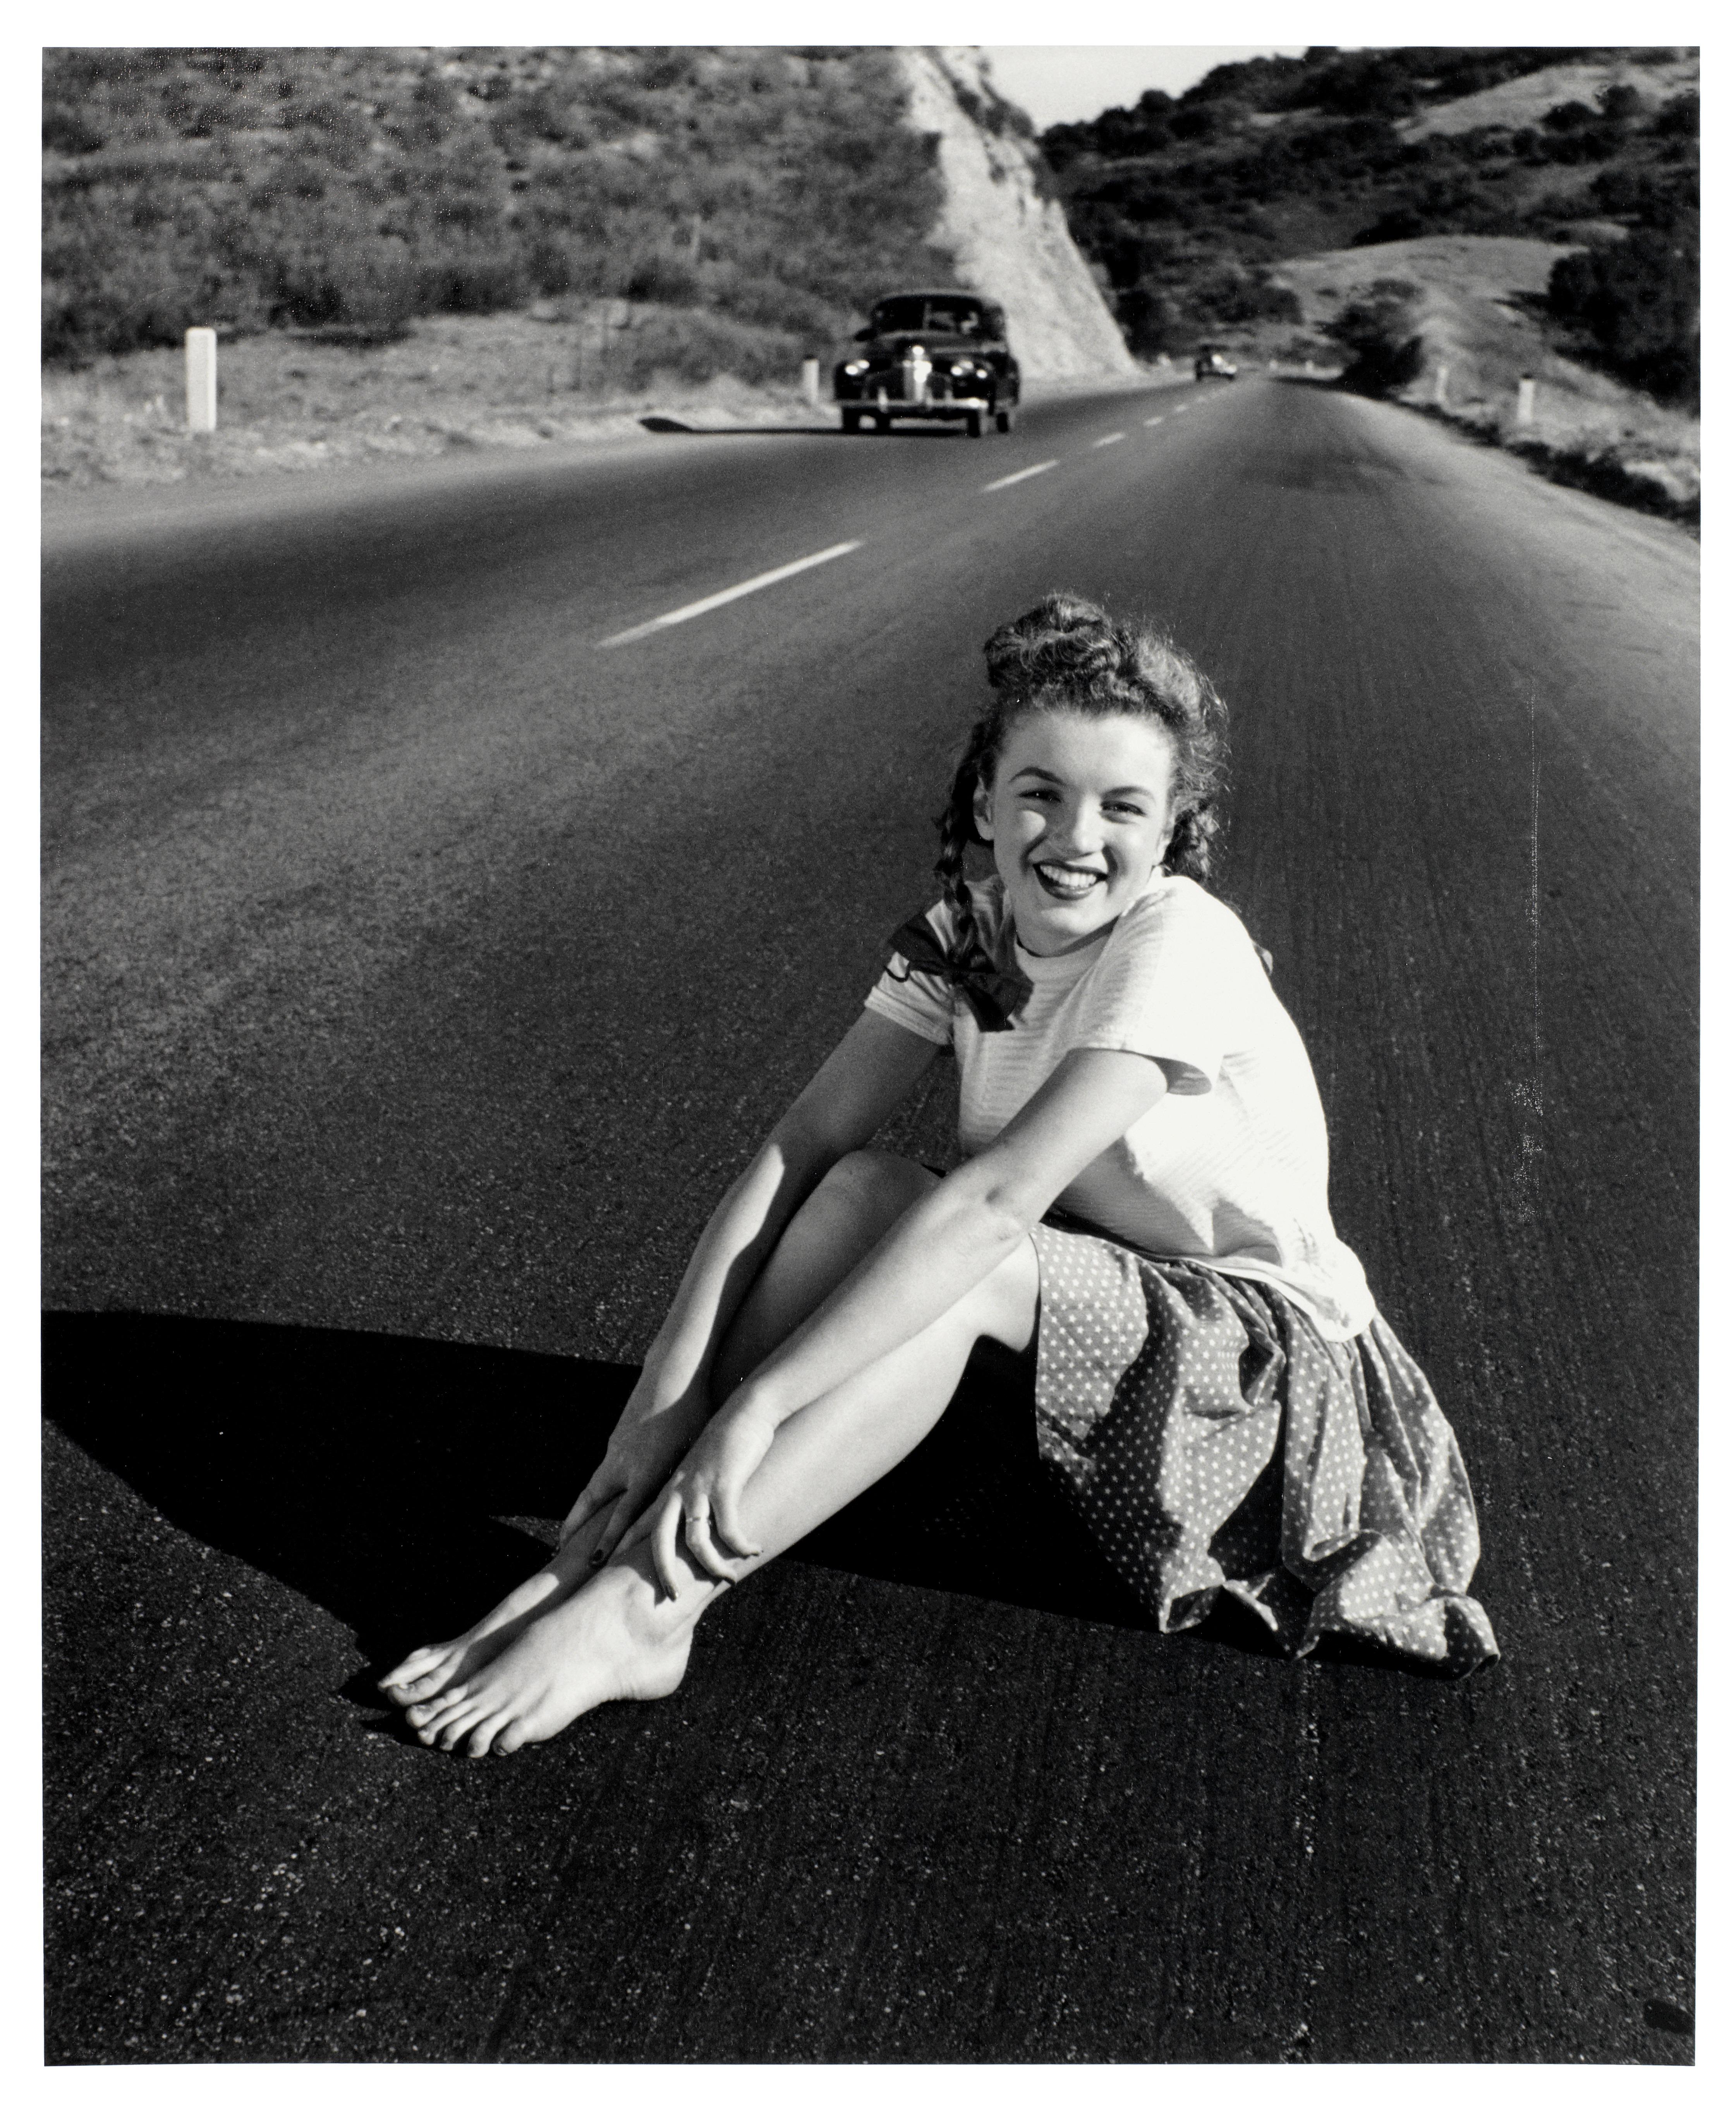 Lot 3 - Andre de Dienes (Romanian/American, b.1913-d.1985): a silver gelatin print of a young Marilyn Mon...